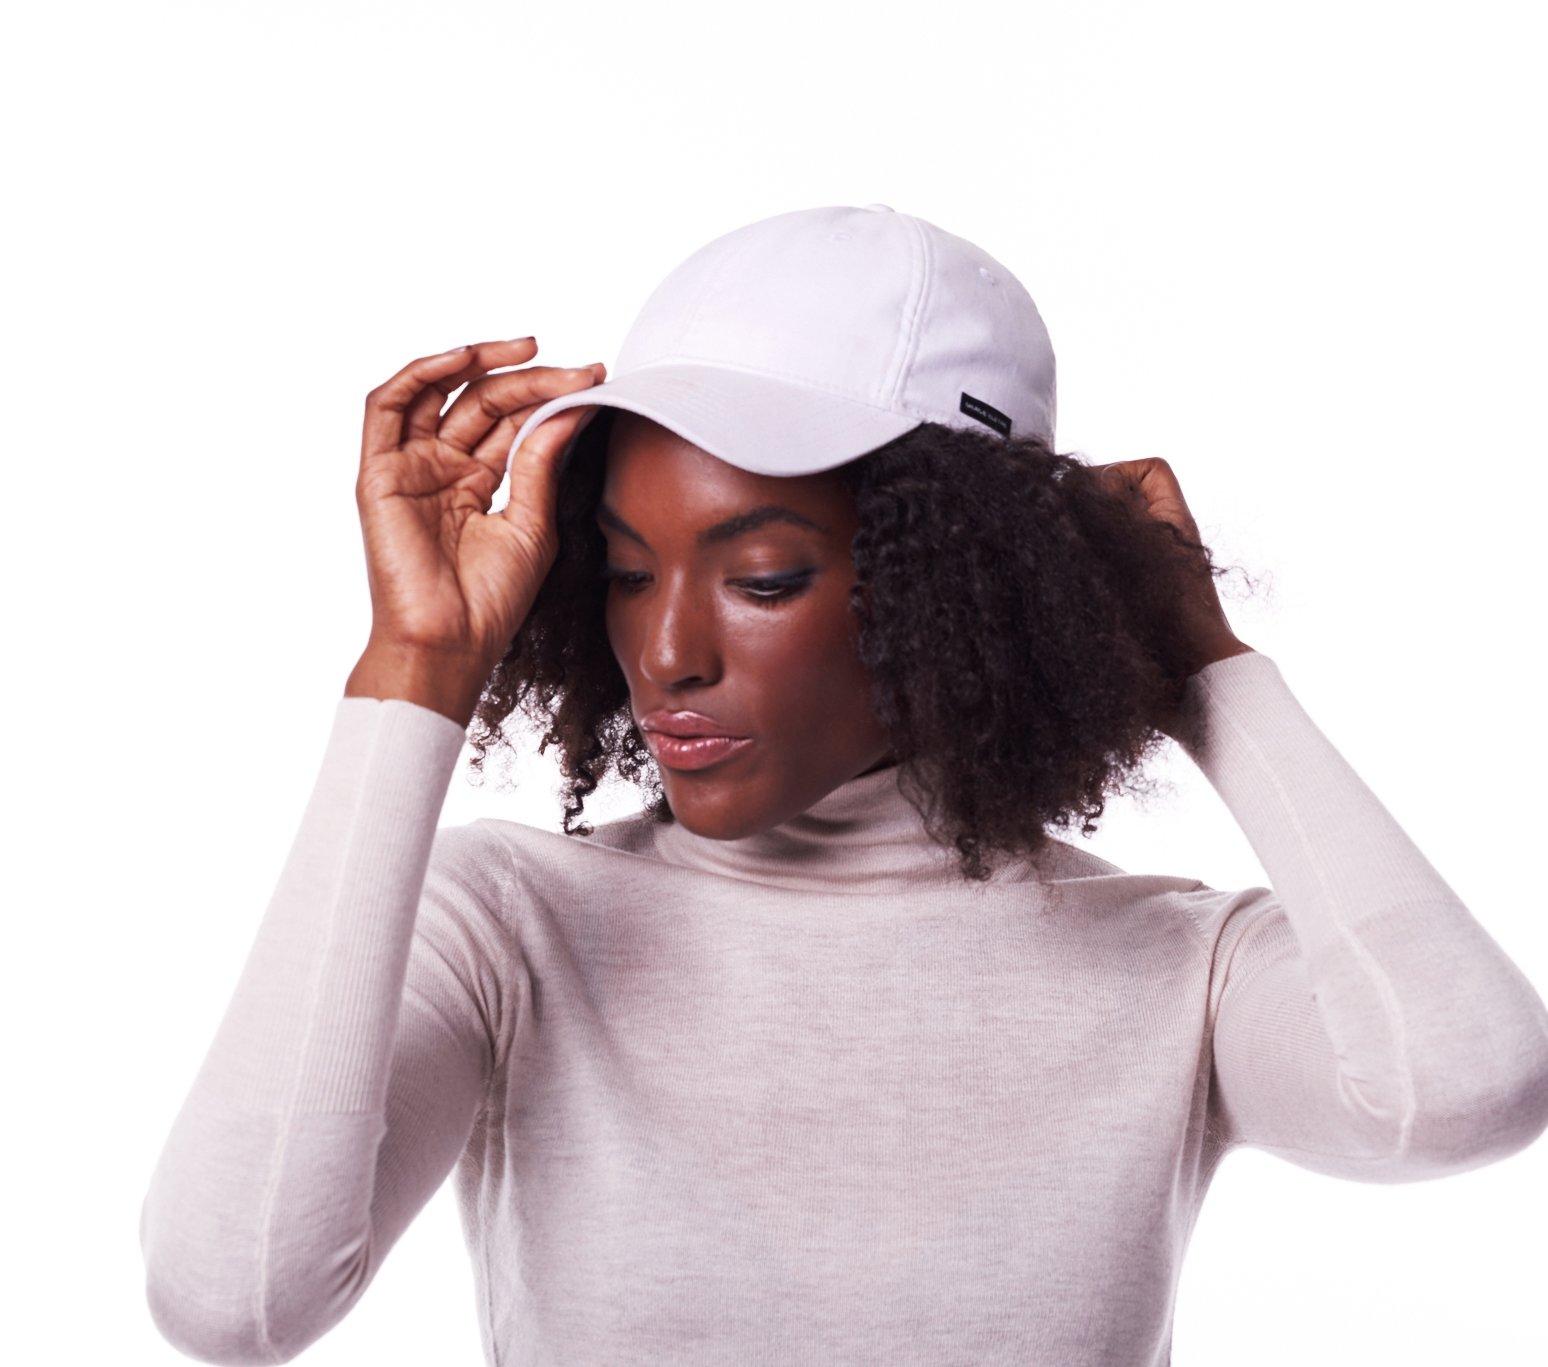 Grace Eleyae Women's Baseball Cap - Slap - Satin Lined Dad Hat, White